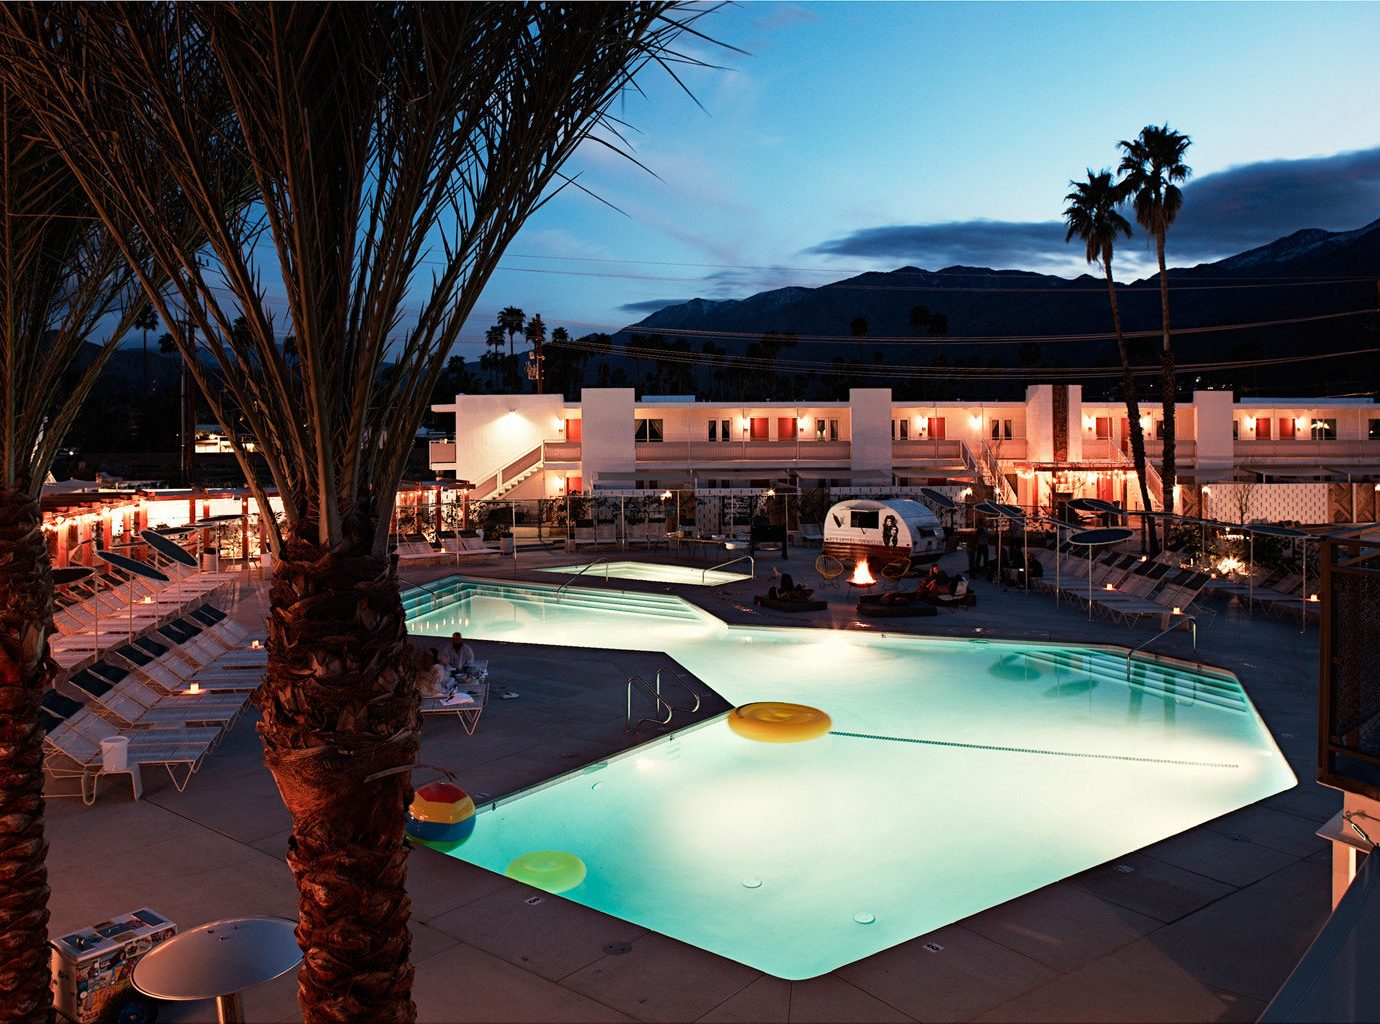 Hip Hotels Luxury Modern Pool leisure outdoor swimming pool estate Resort evening light